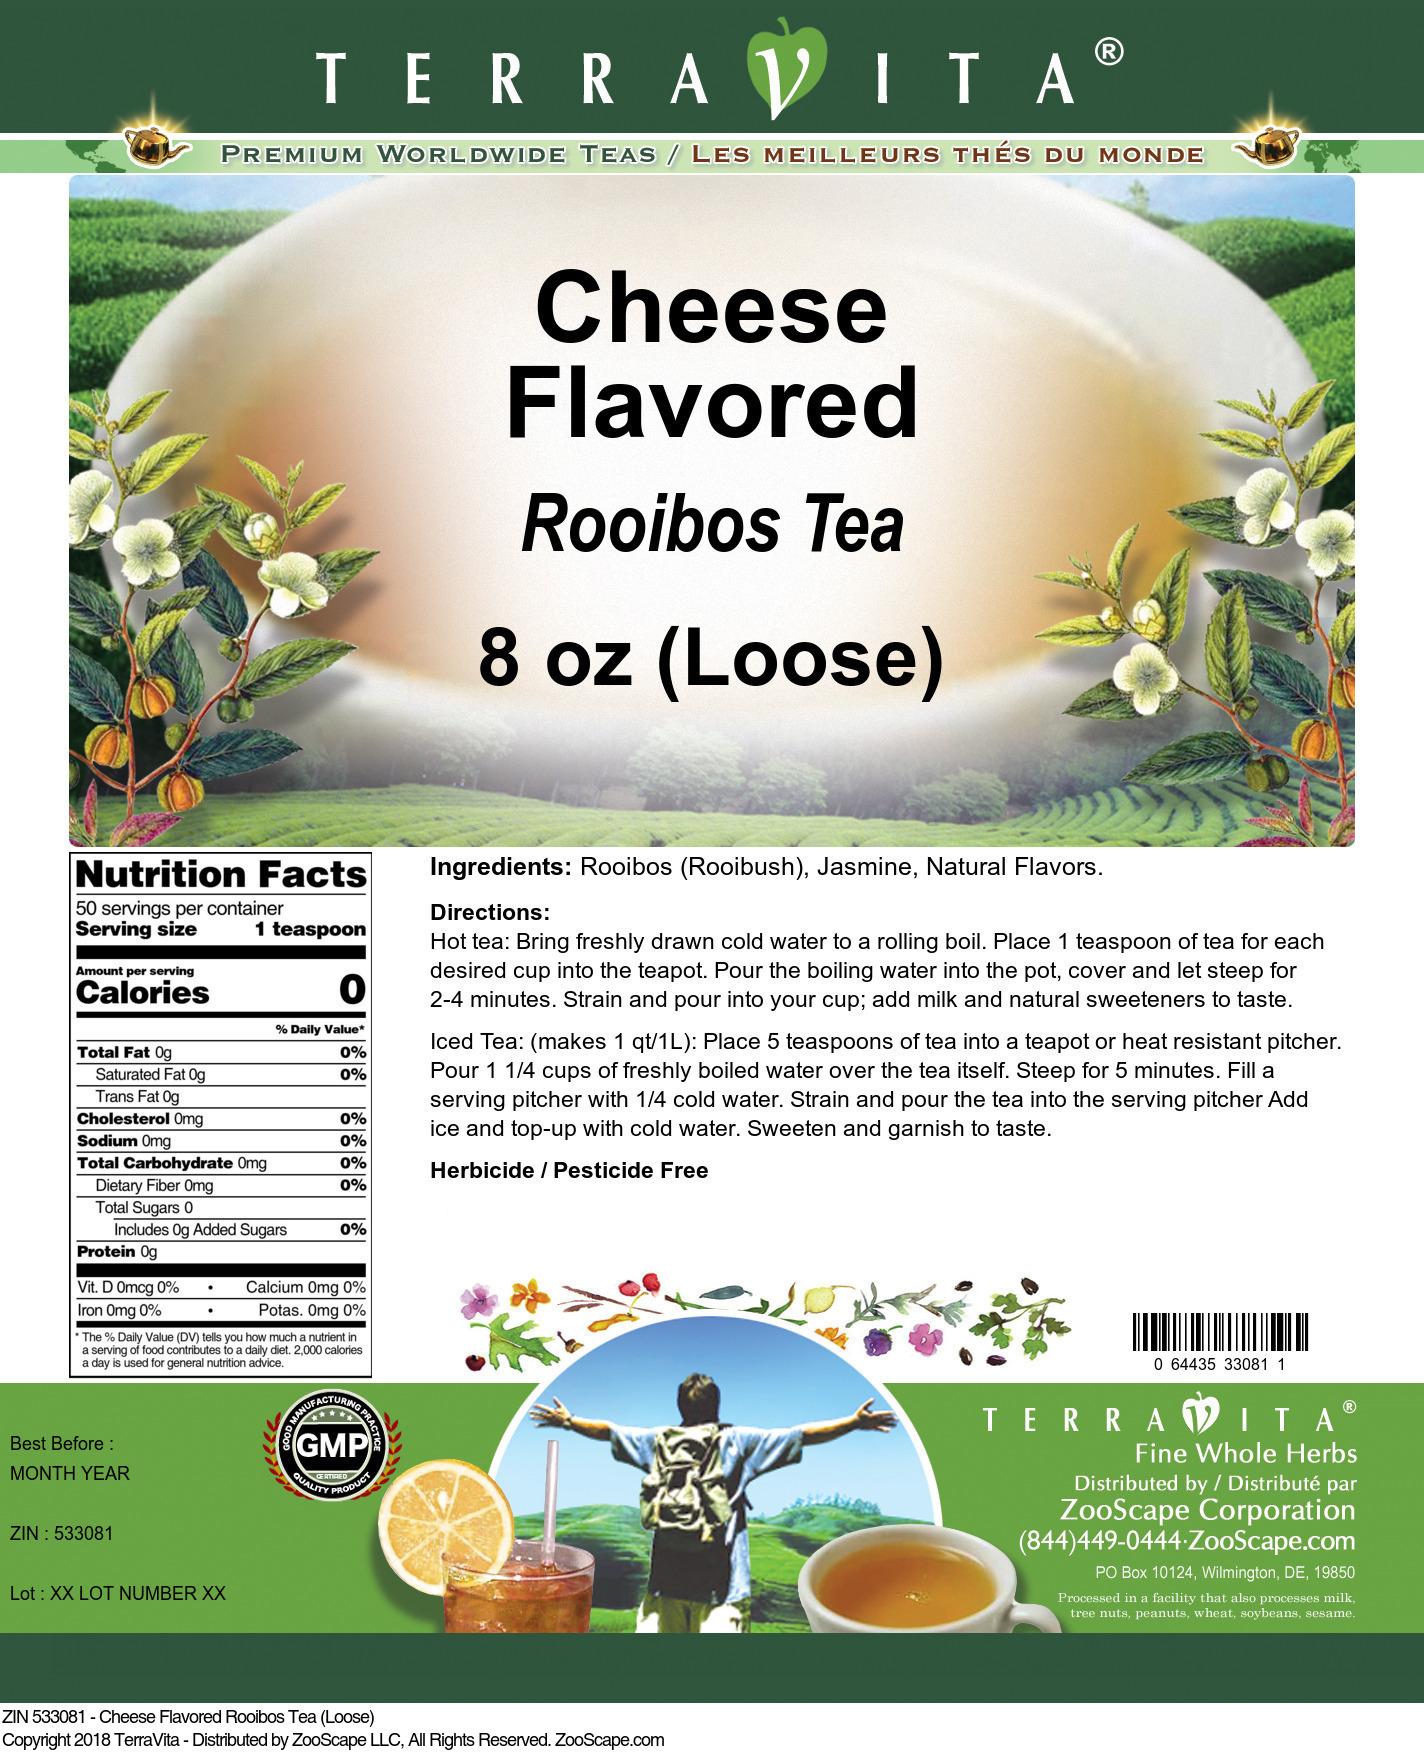 Cheese Flavored Rooibos Tea